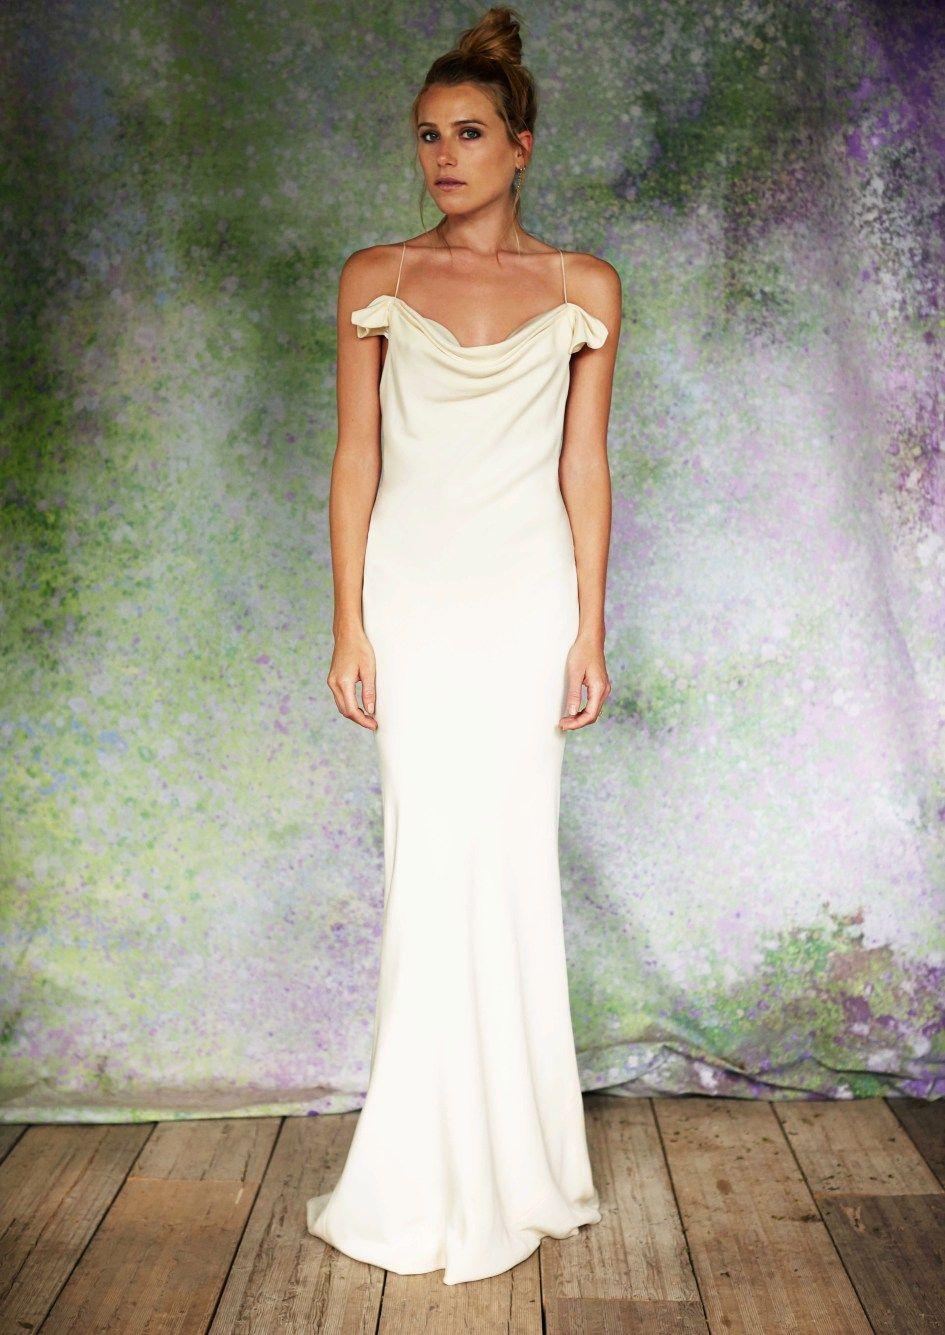 Stone Fox Bride x Savannah Miller   Pinterest   Savannah miller ...